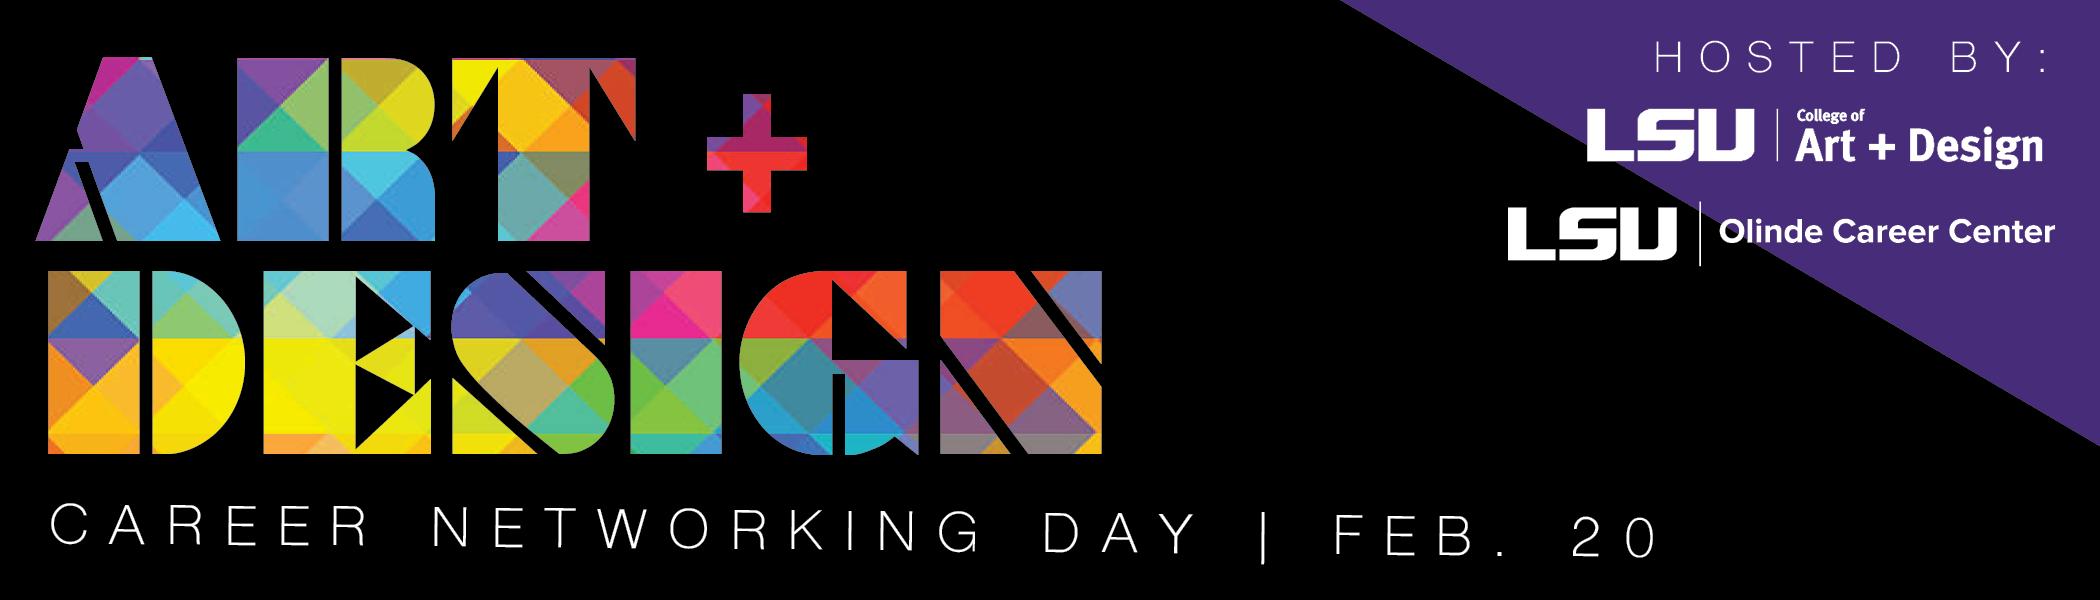 Art & Design Career Networking Day Feb. 20, 2019